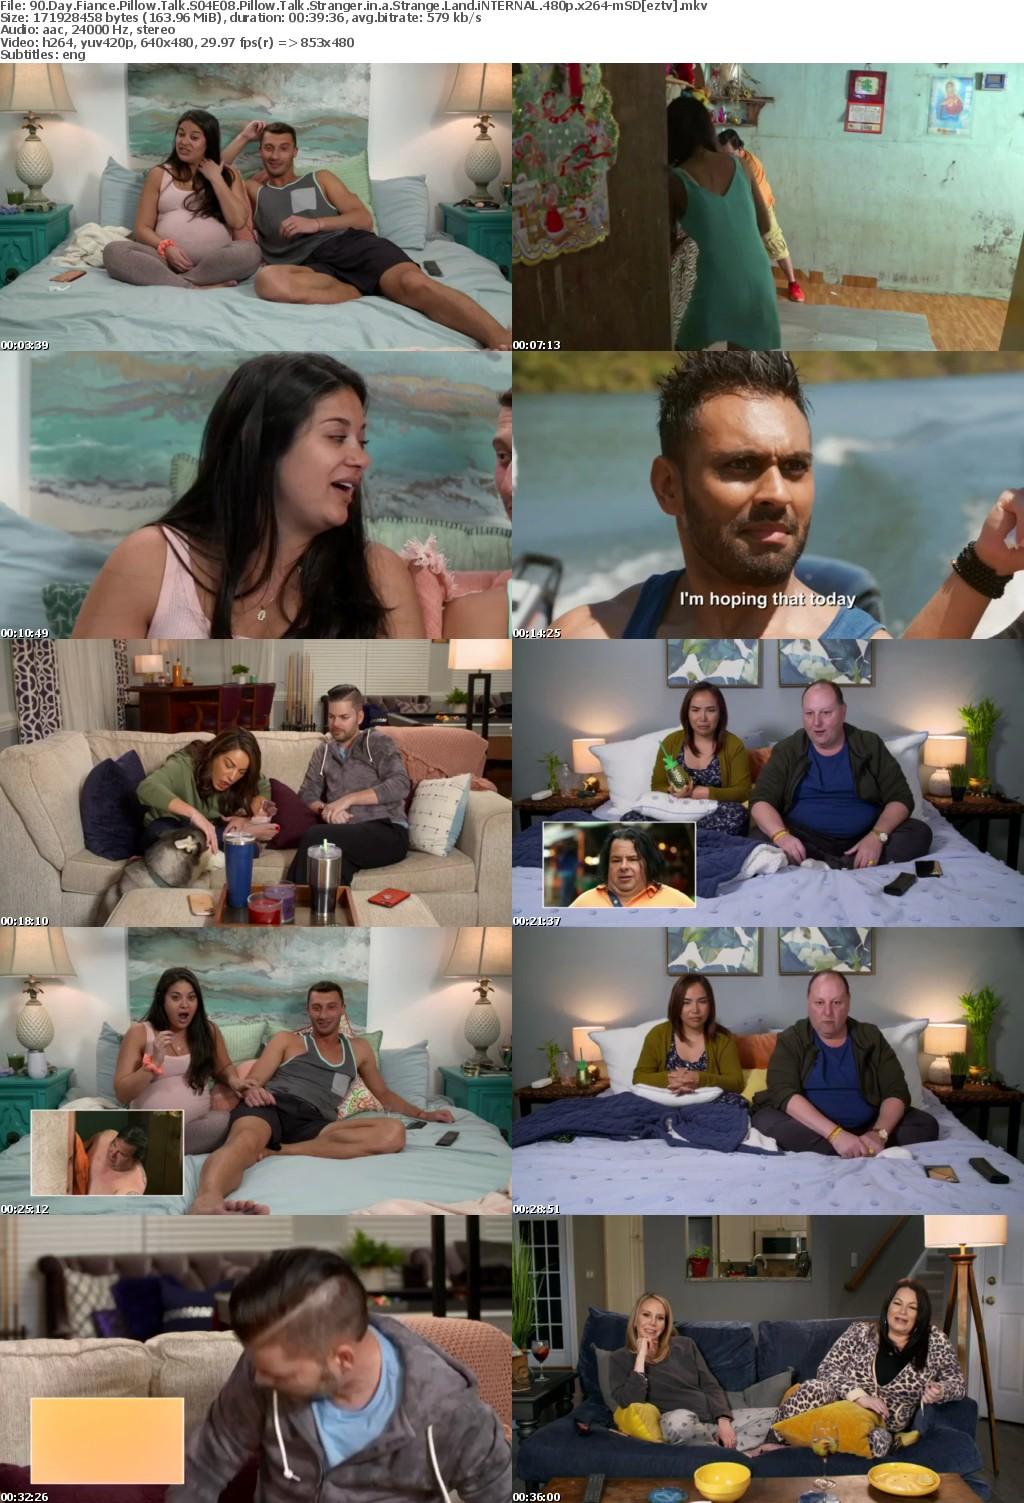 90 Day Fiance Pillow Talk S04E08 Pillow Talk Stranger in a Strange Land iNTERNAL 480p x264-mSD